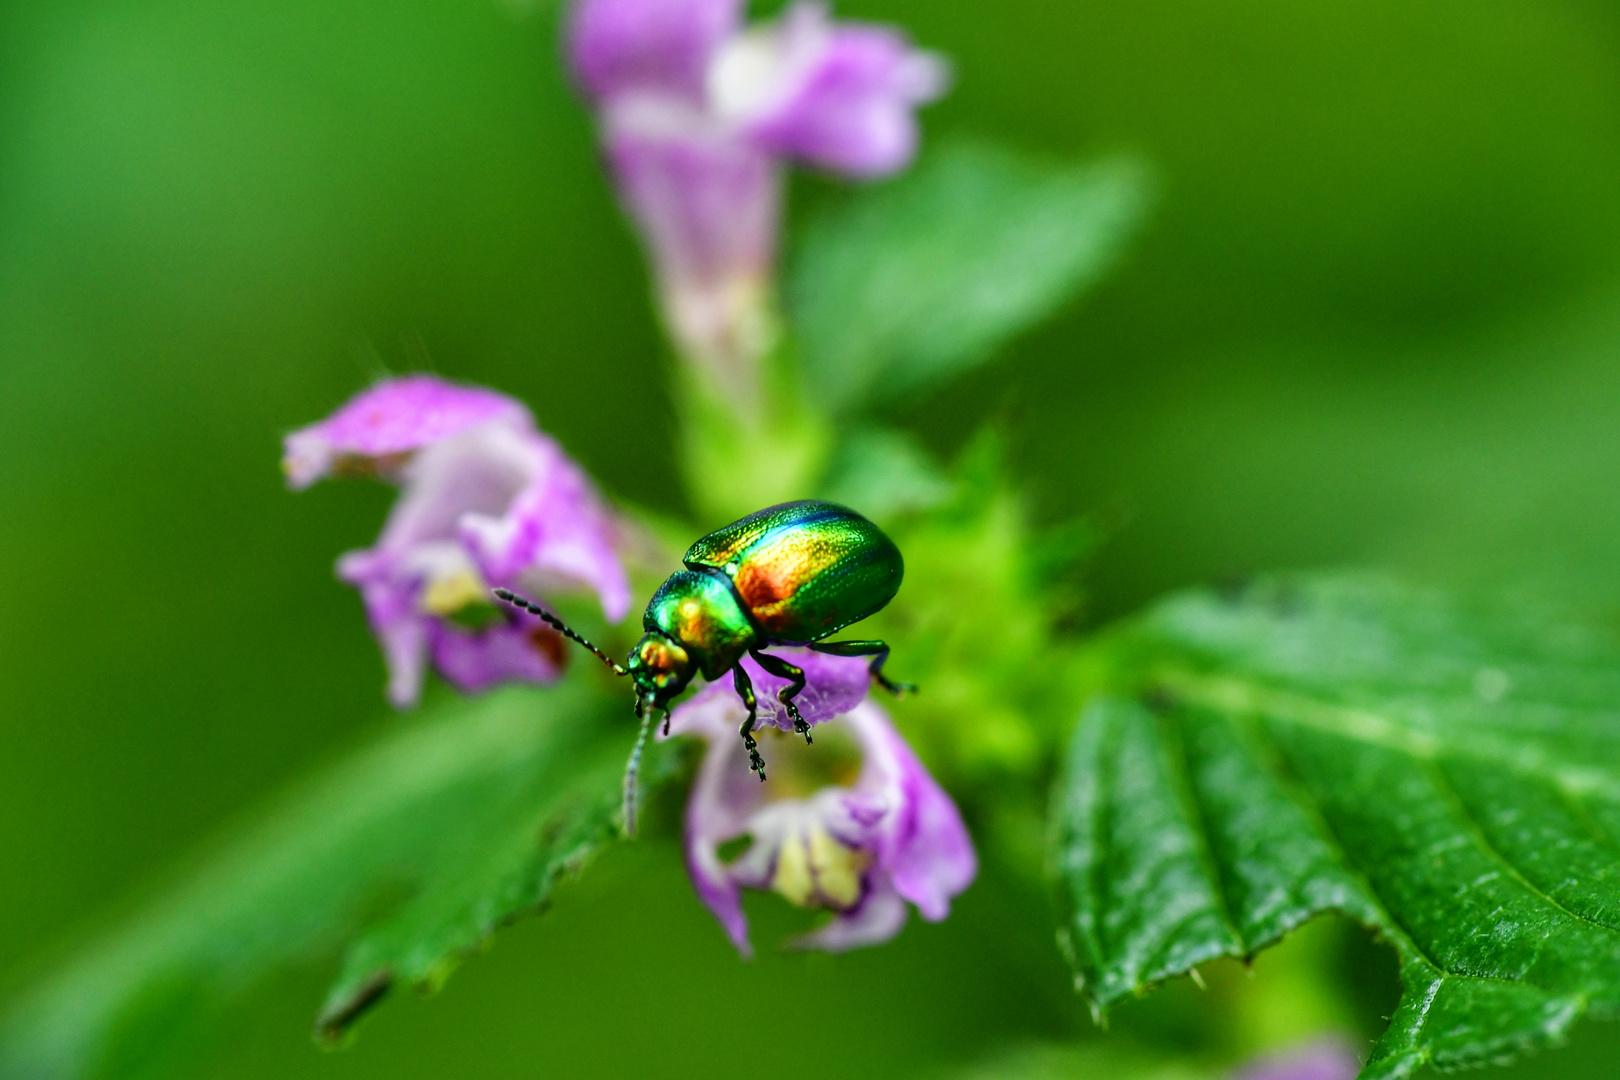 Käfer im Regenbogenkleid